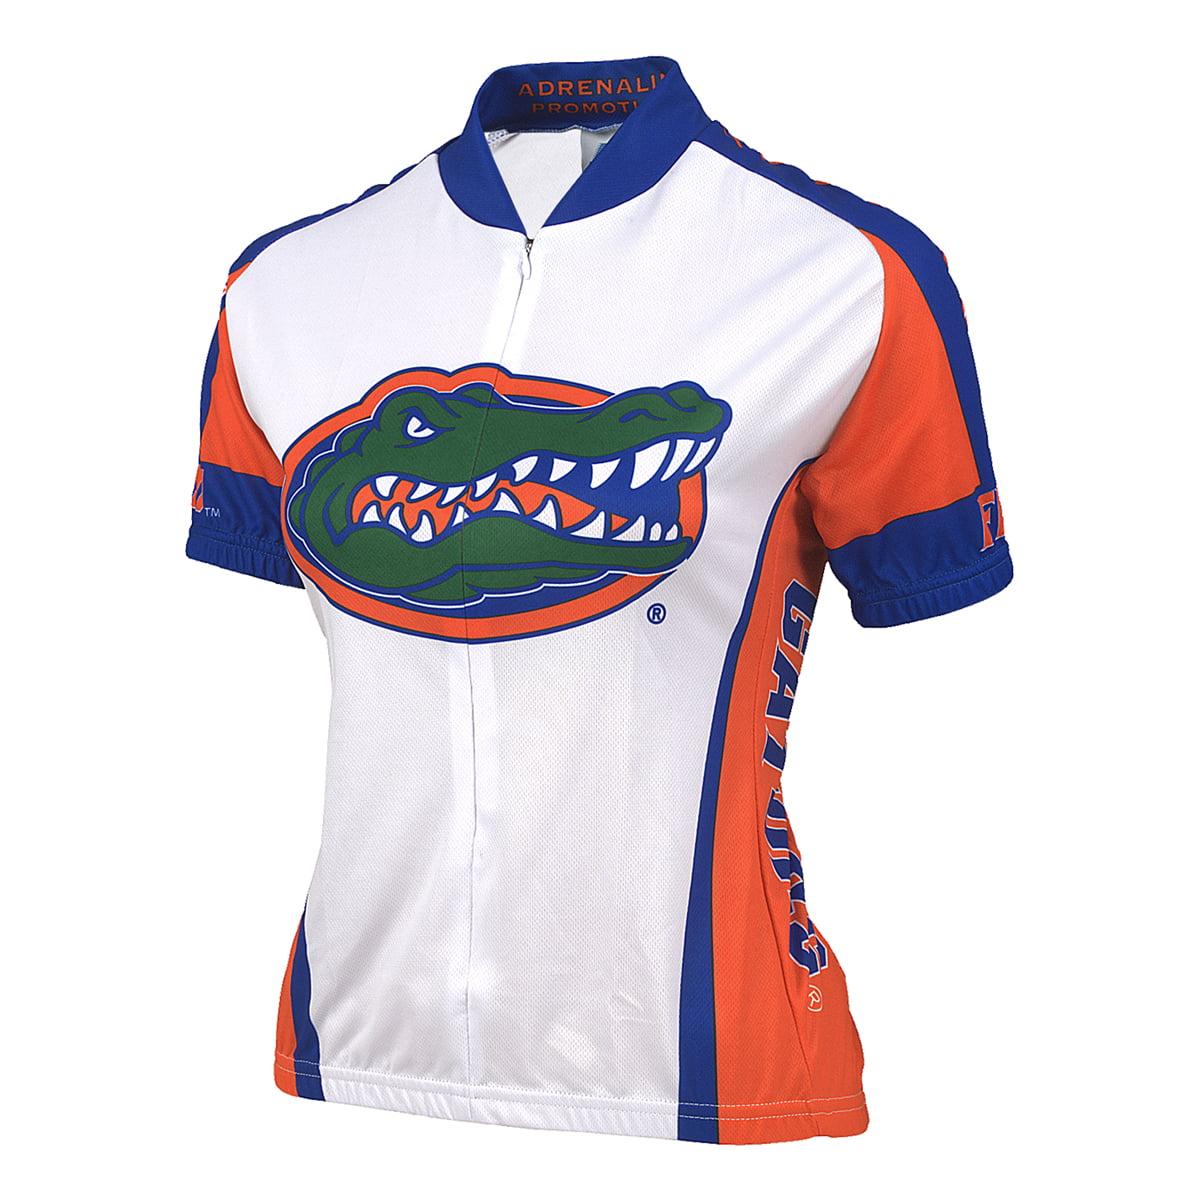 Adrenaline Promotions Women's University of Florida Gators Cycling Jersey